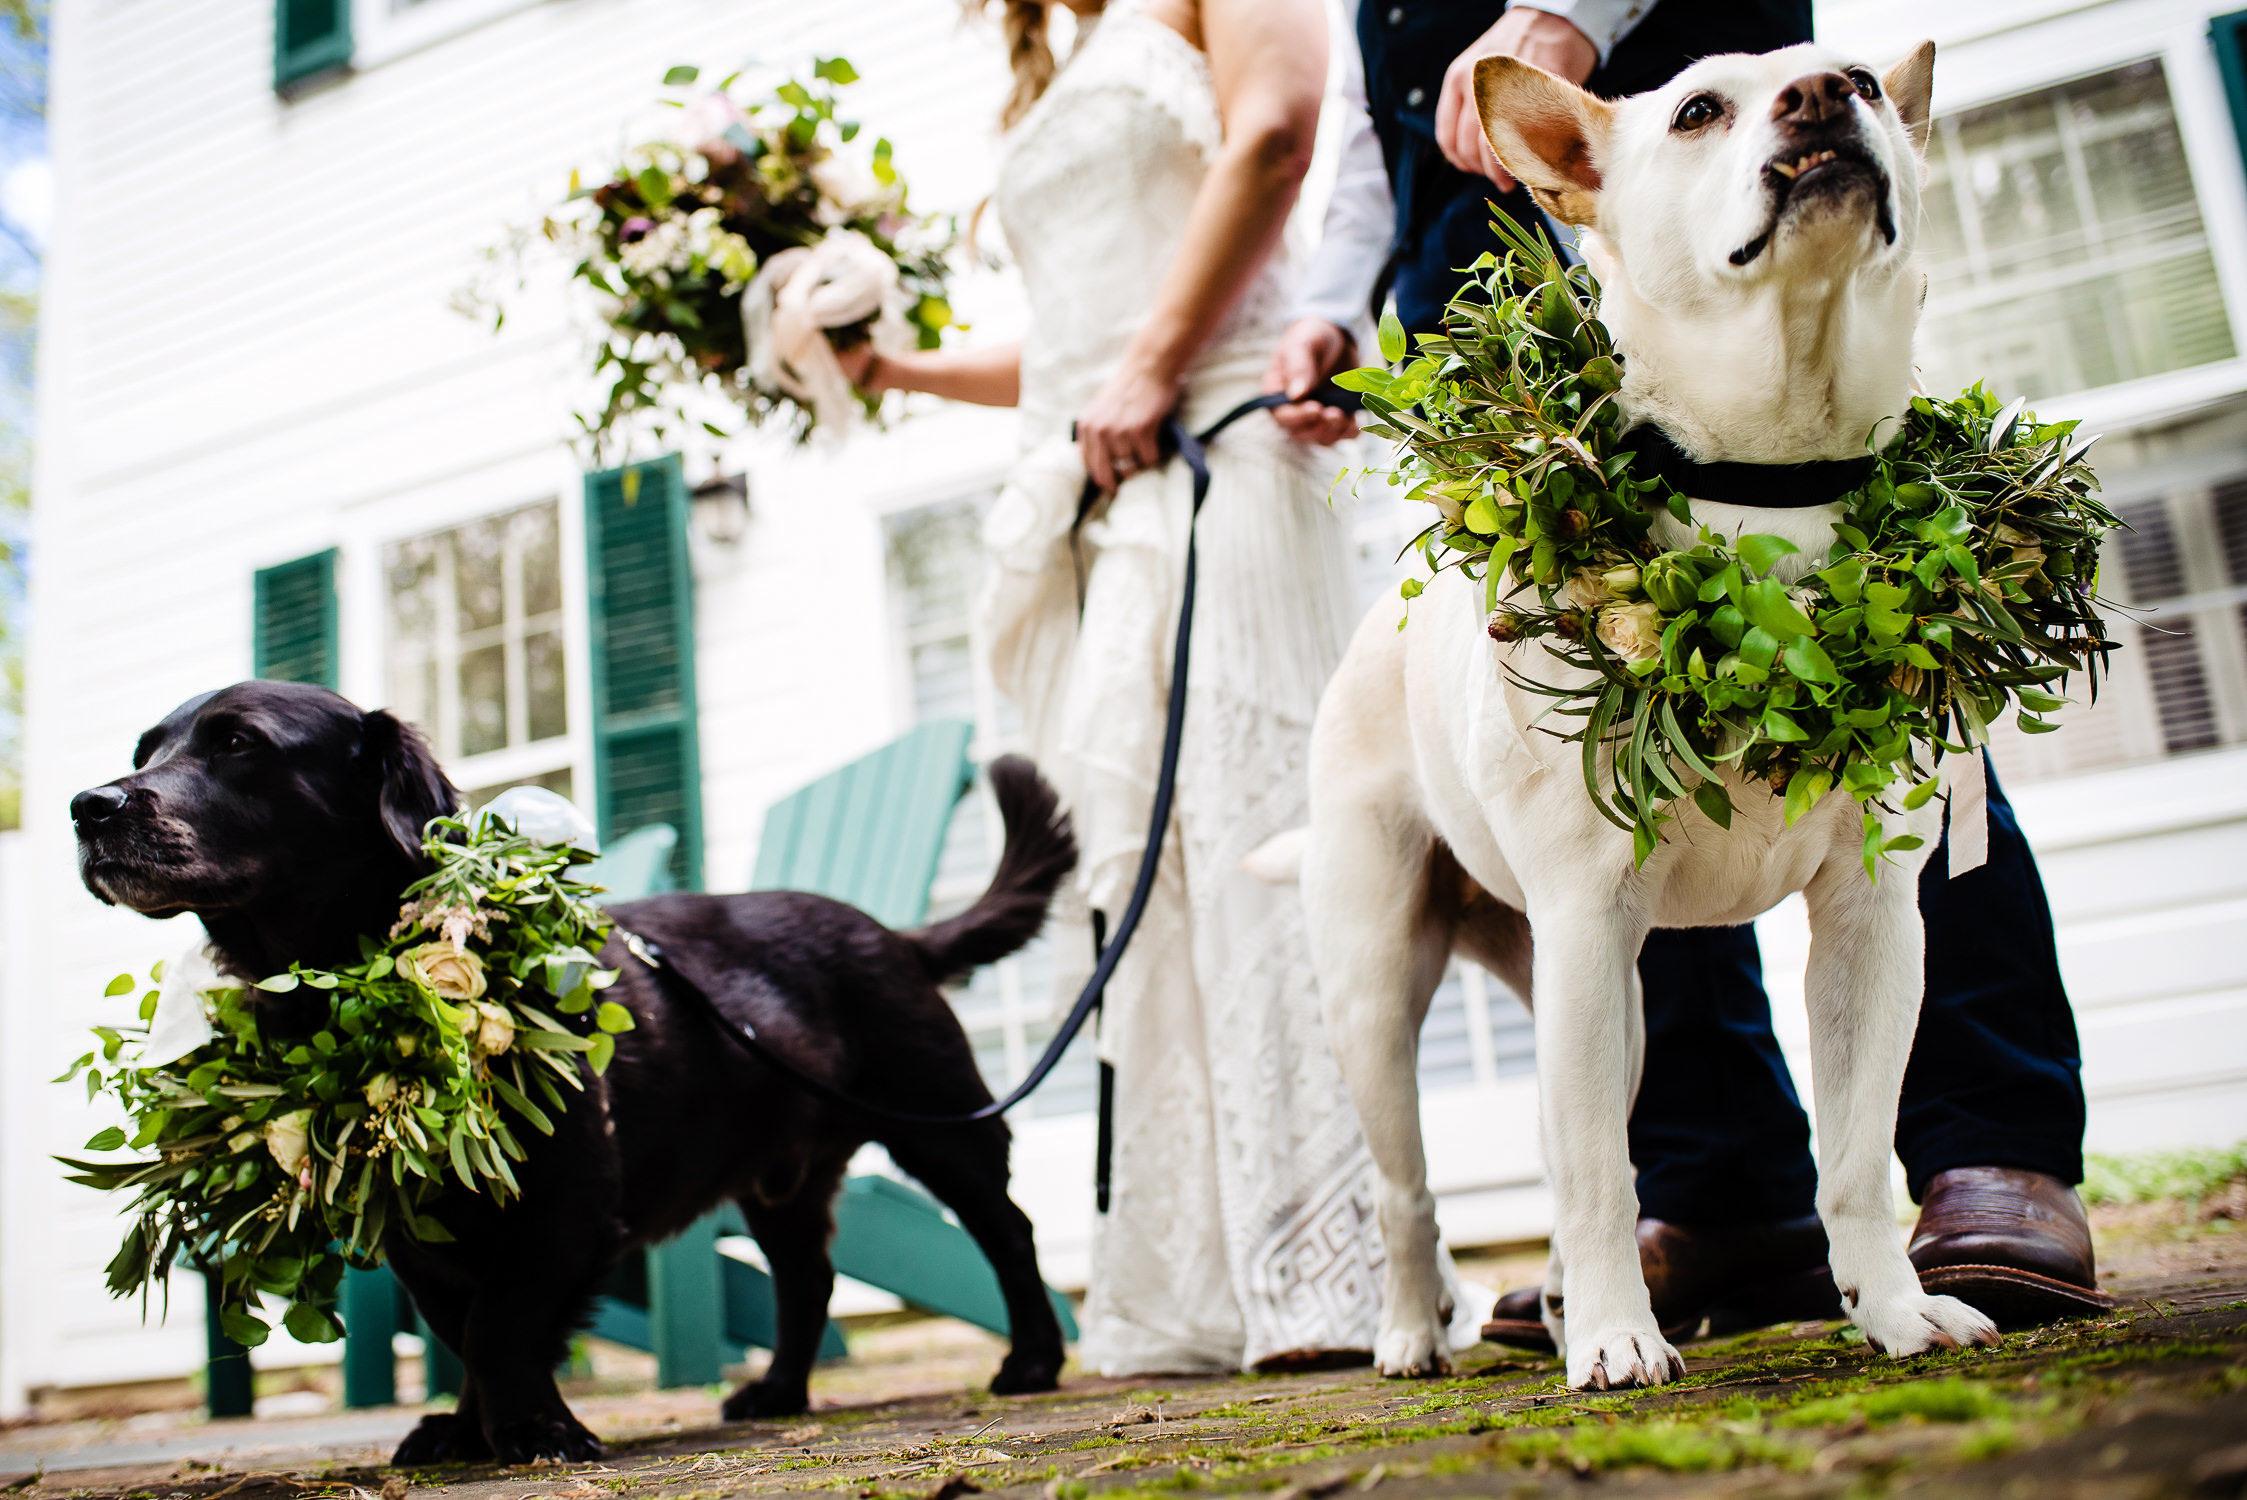 tourterelle-vermont-wedding-photographers-008-2-2247x1500.jpg